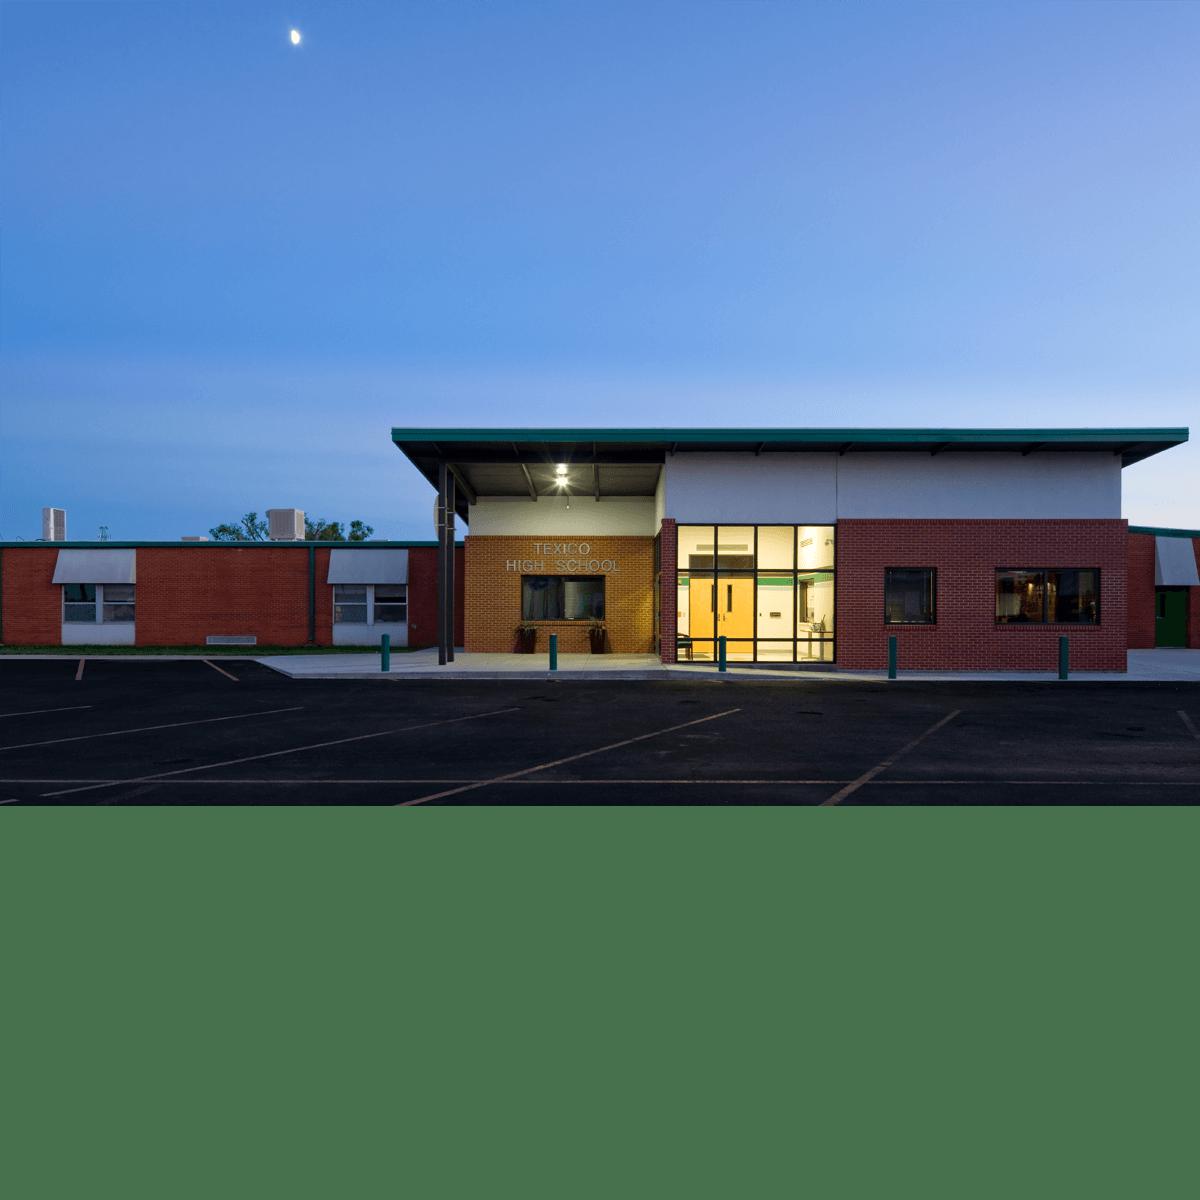 Texico Municipal Schools